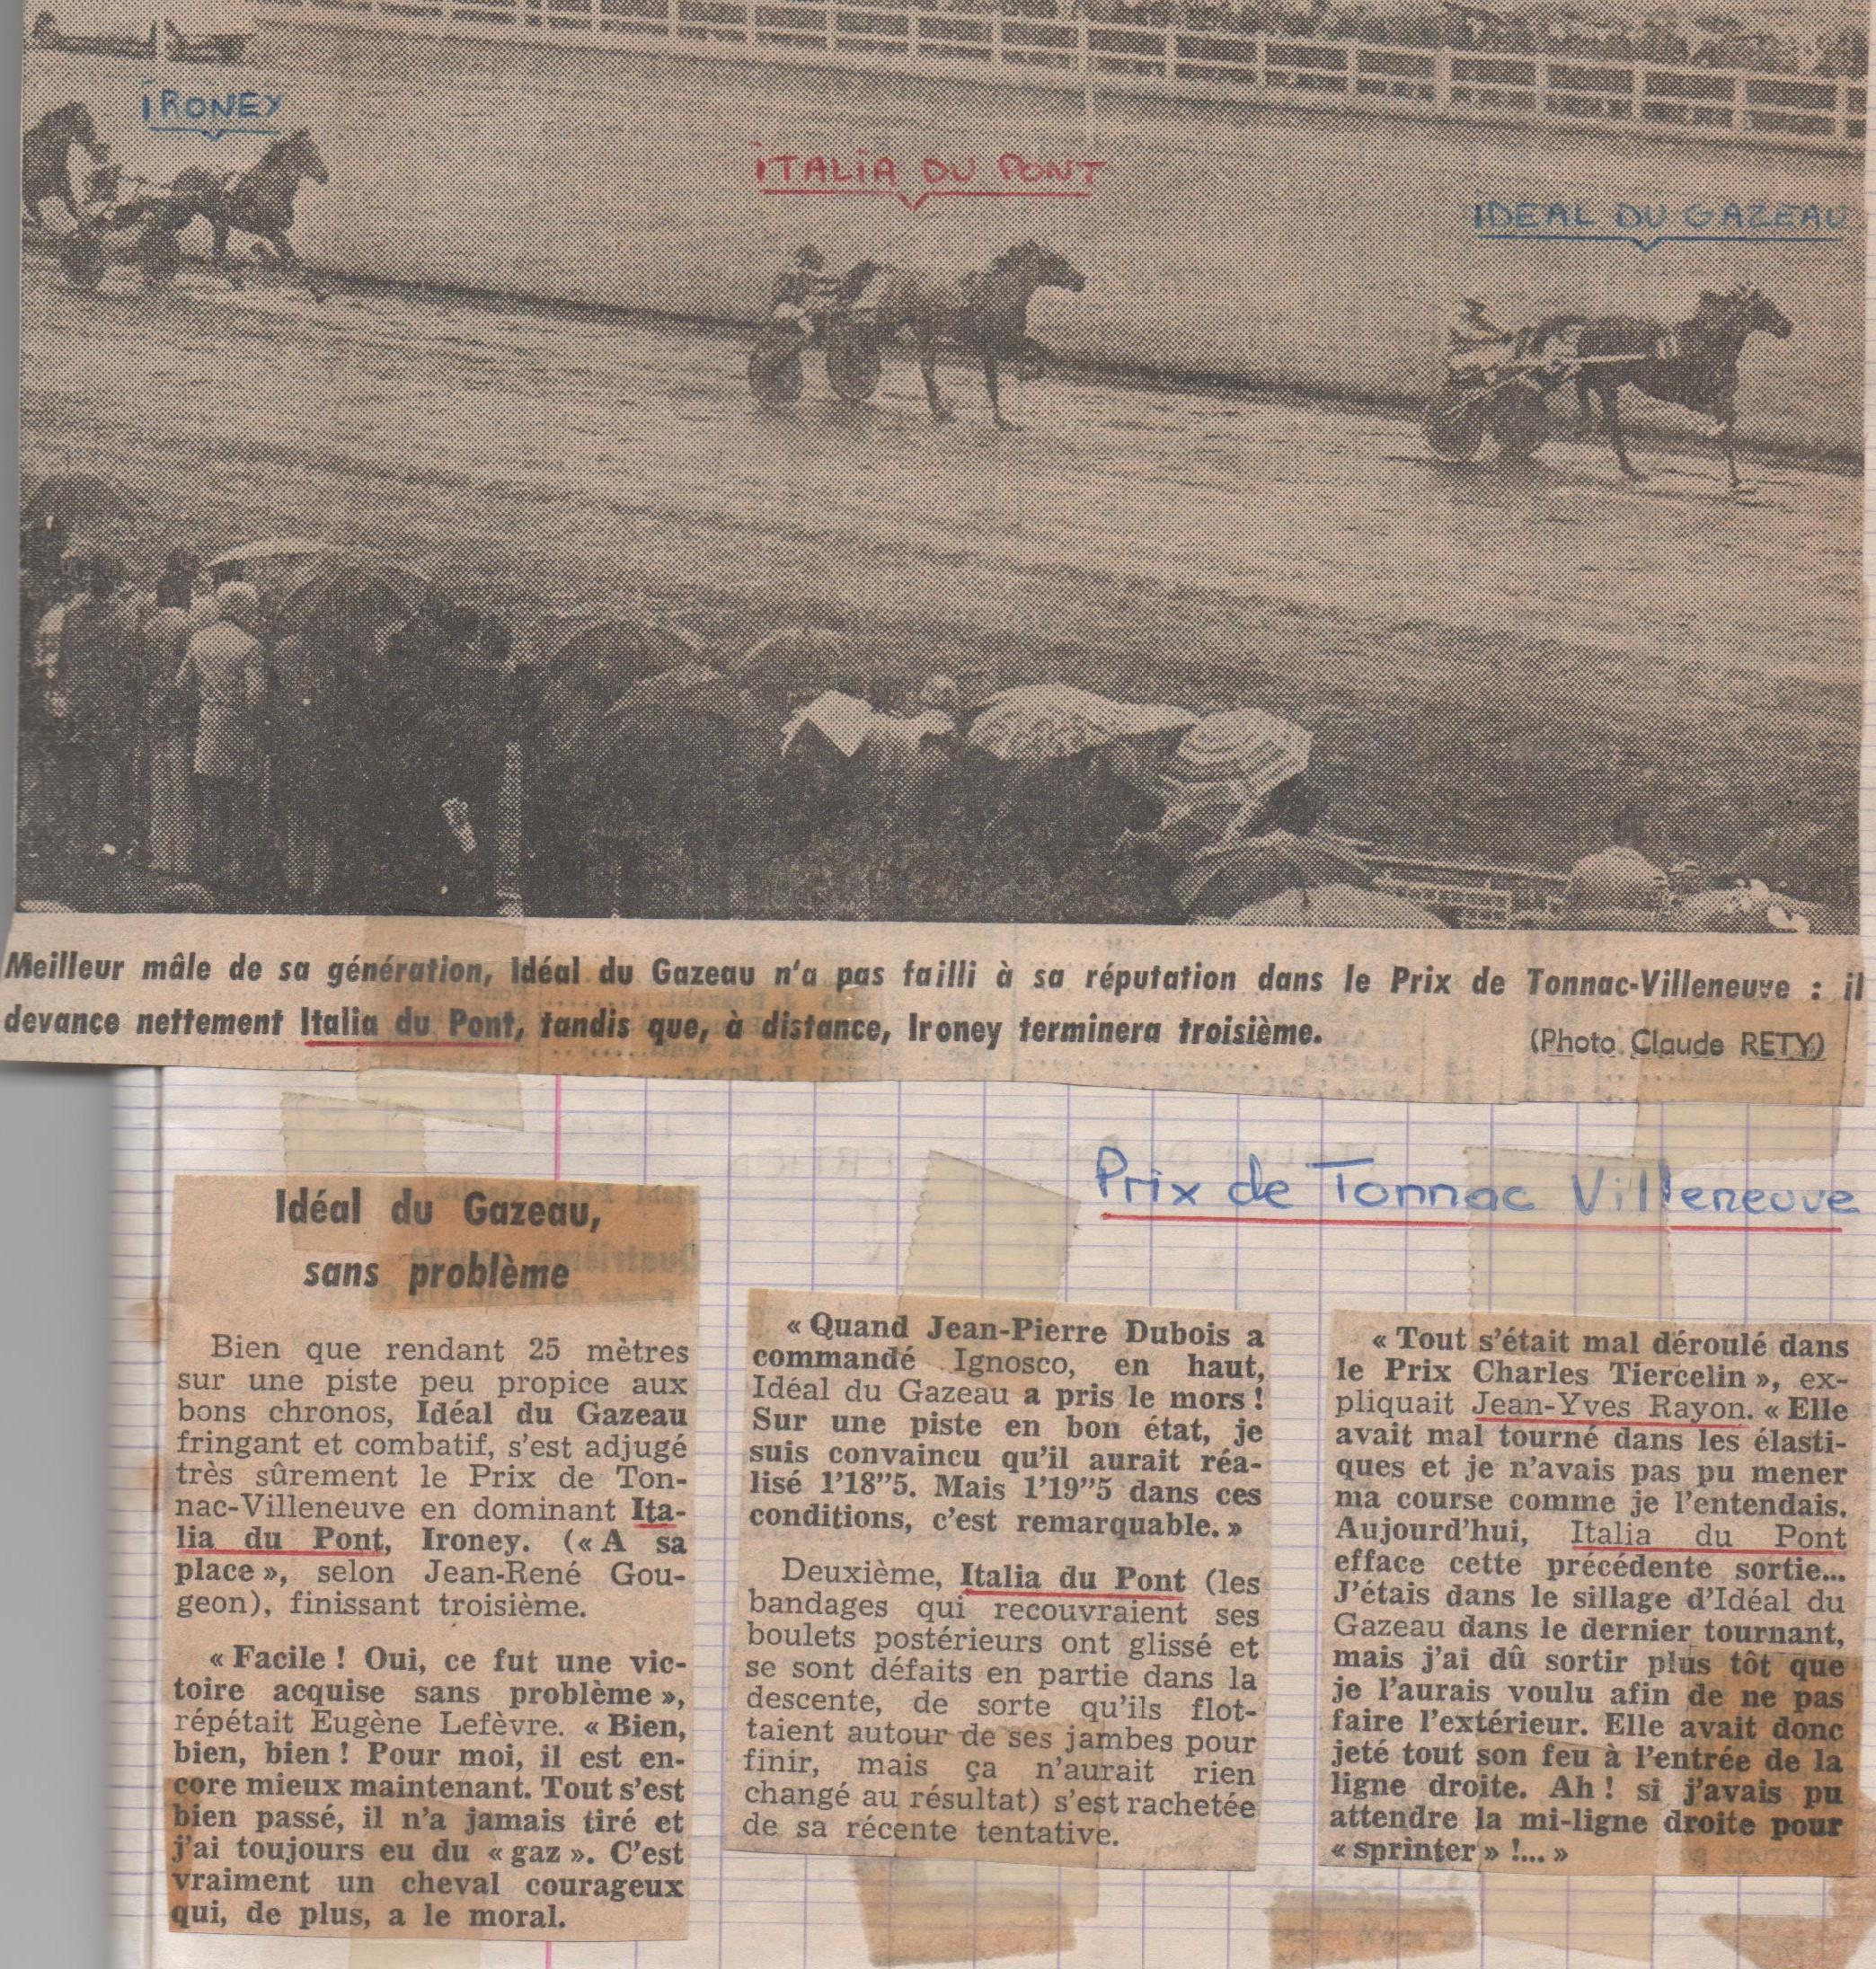 1978 01 22 Italia du Pont Prix de Tonnac Villeneuve